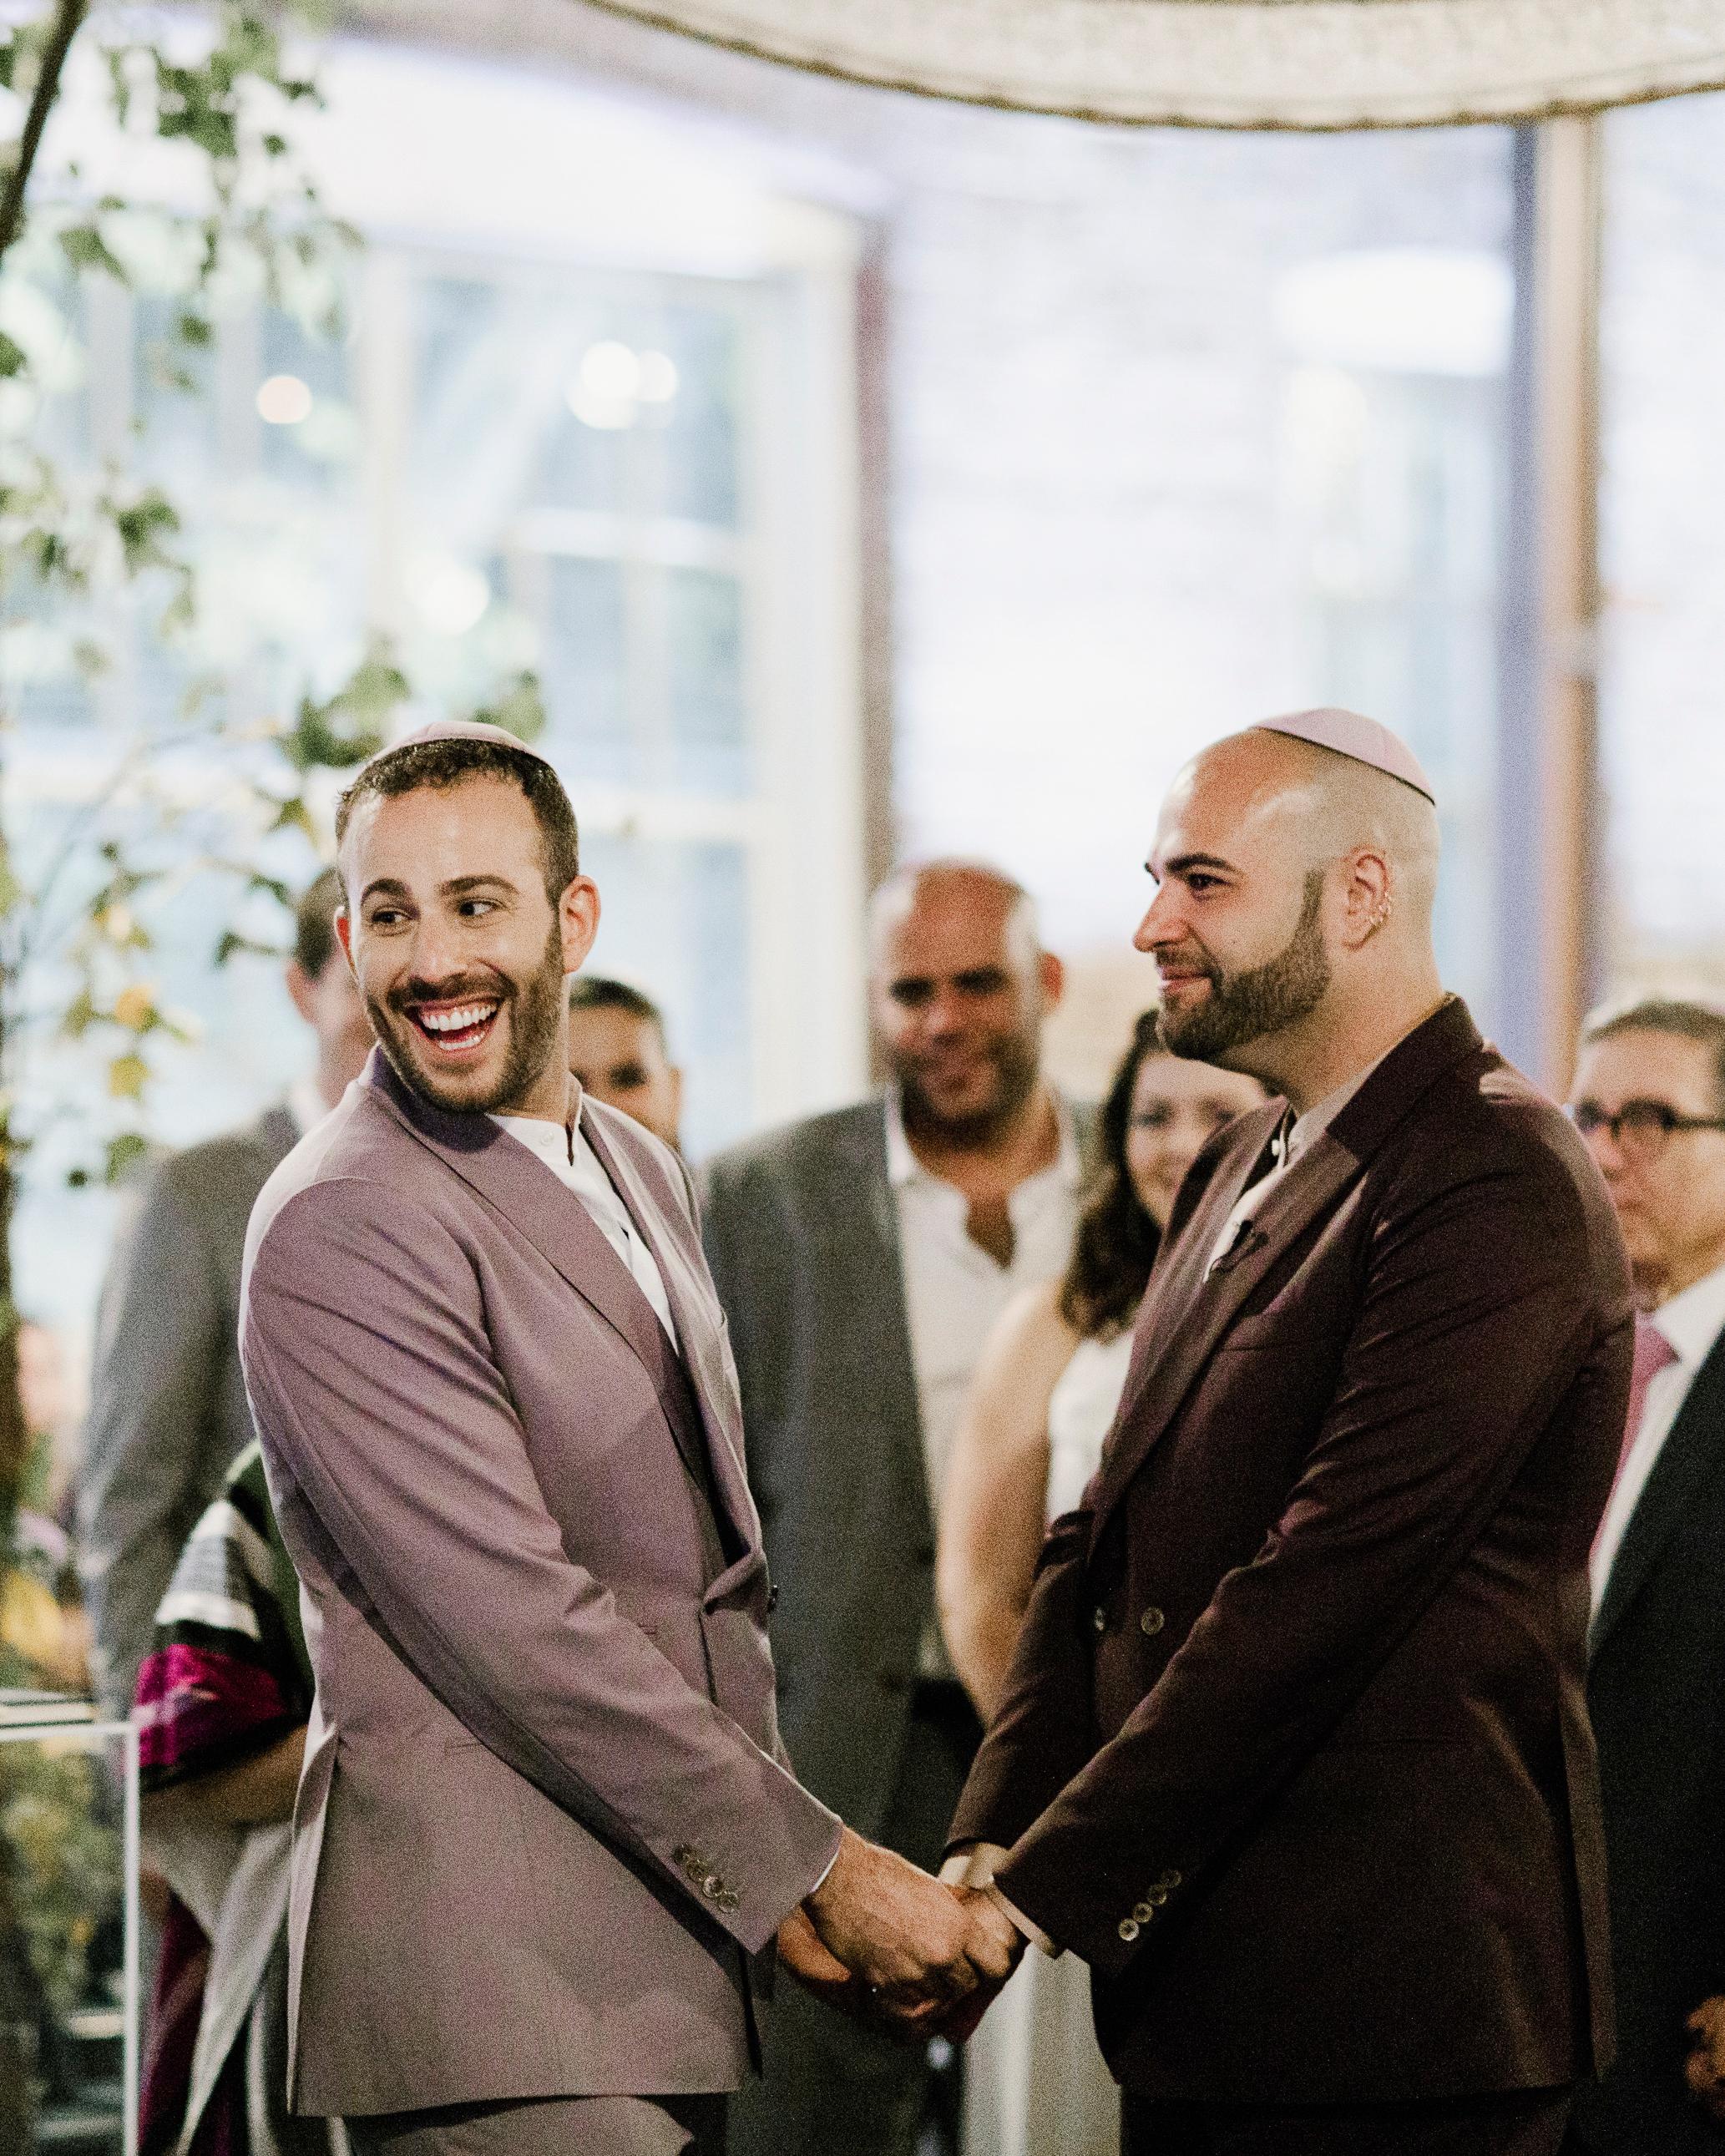 micah jason wedding grooms ceremony same sex jewish